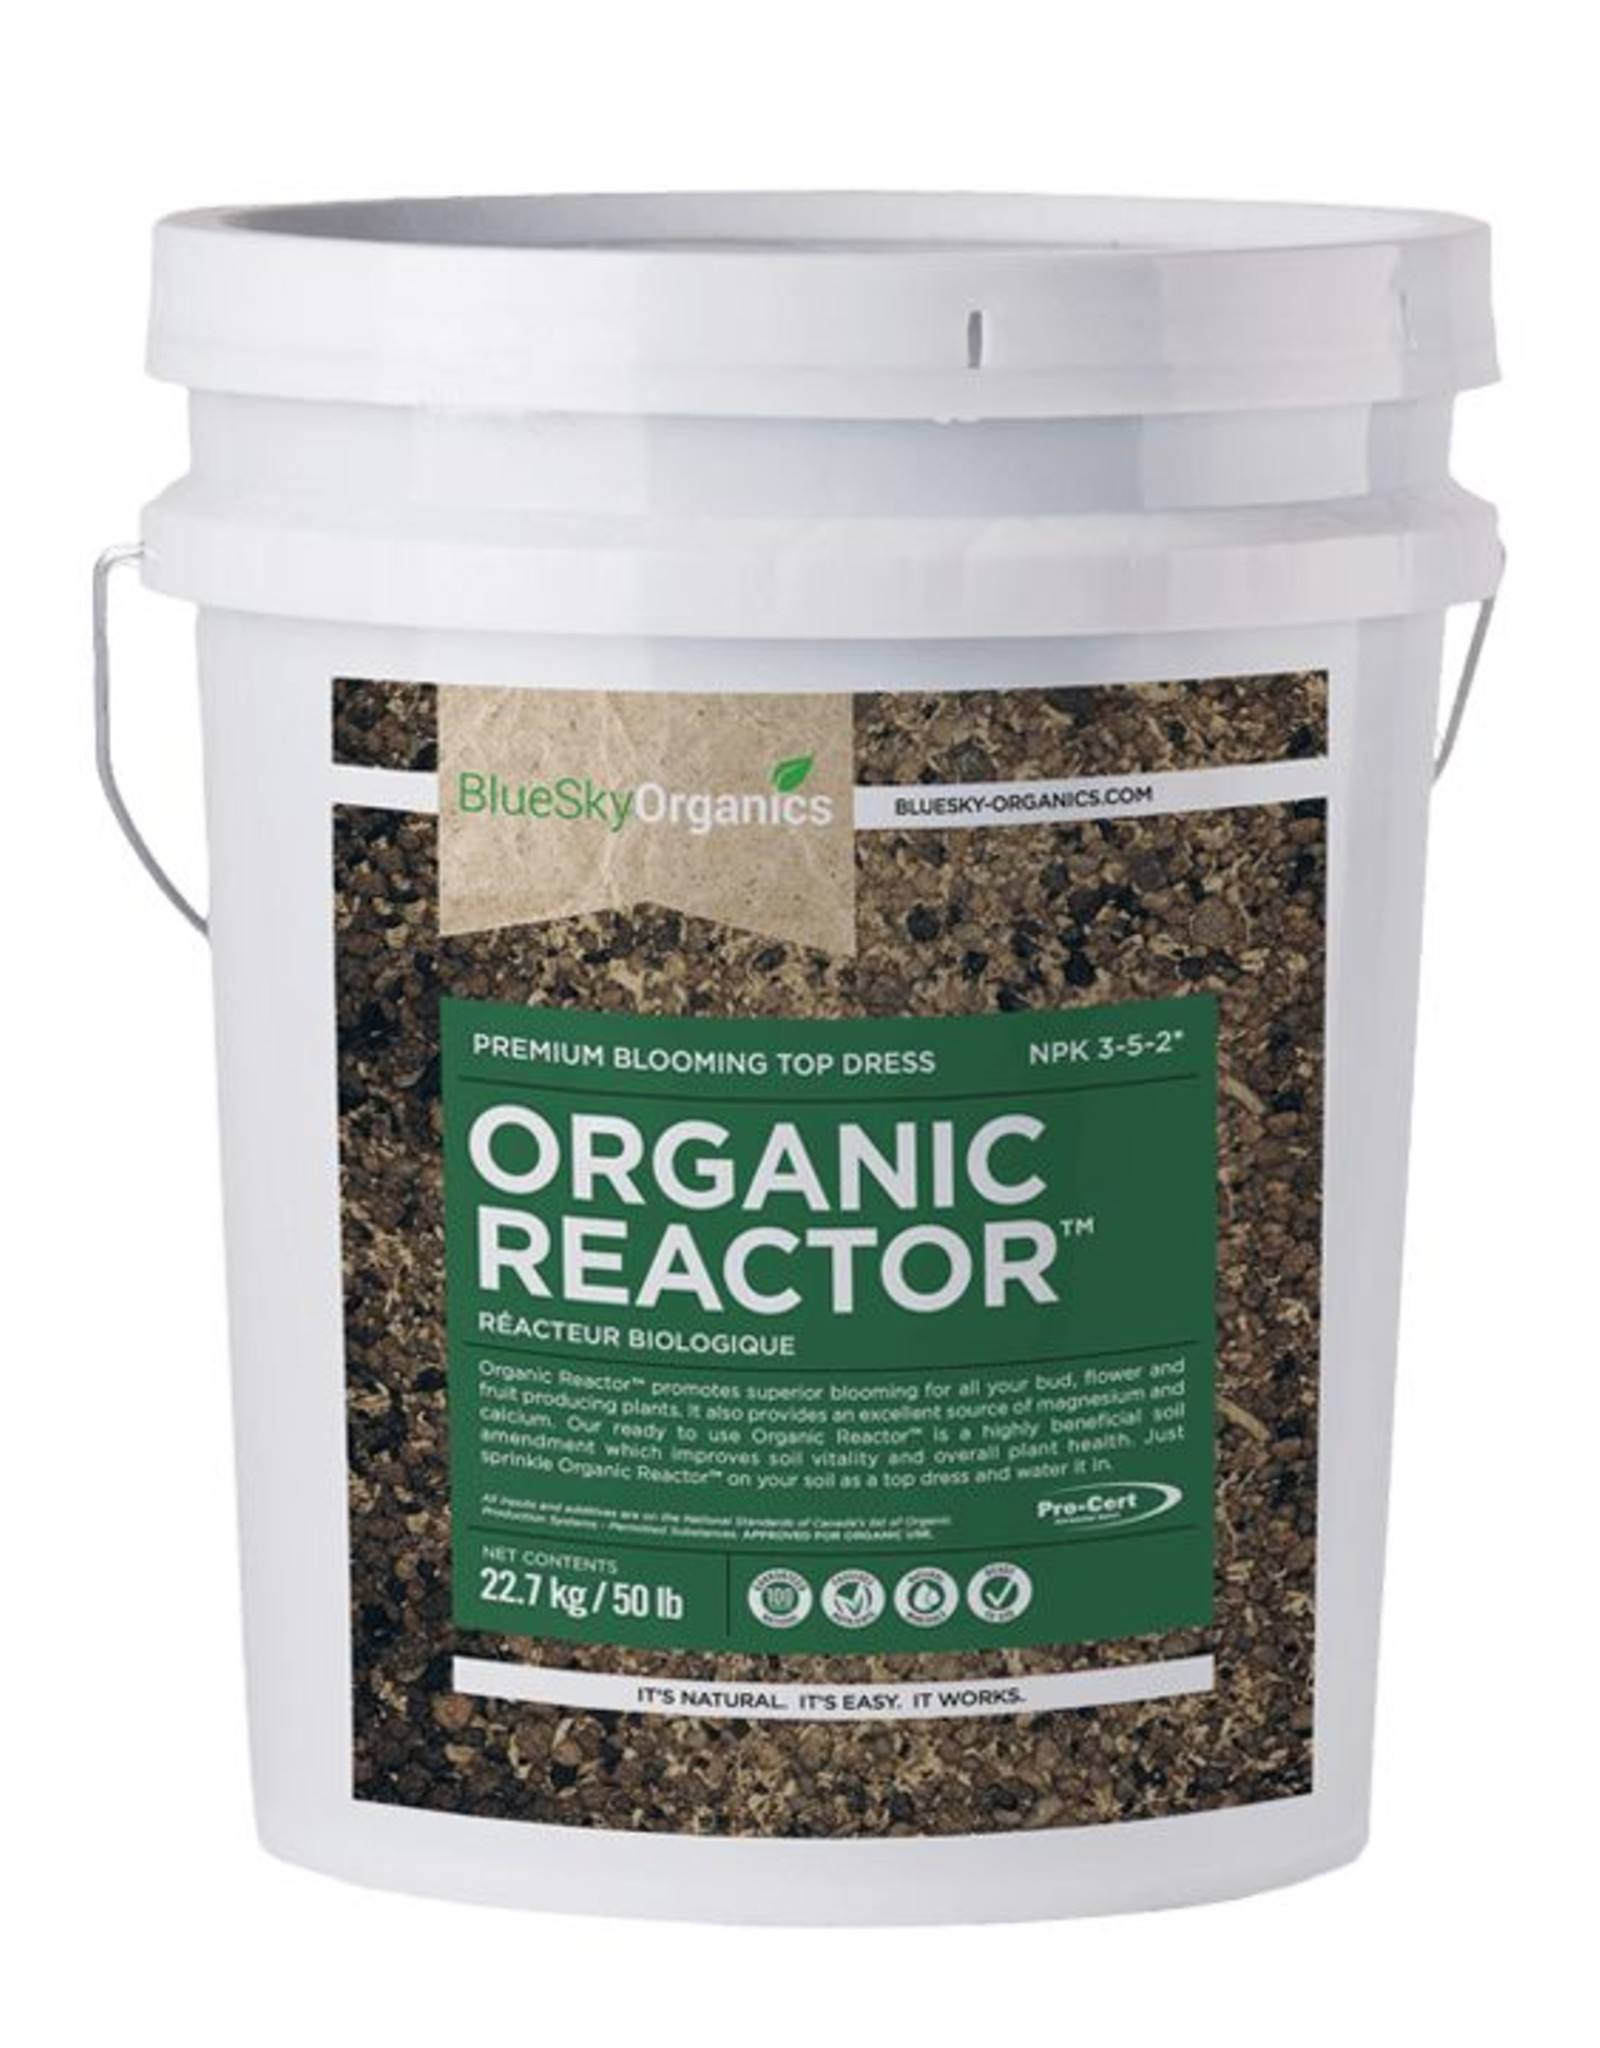 BlueSky Organics Organic Reactor 22.7Kg